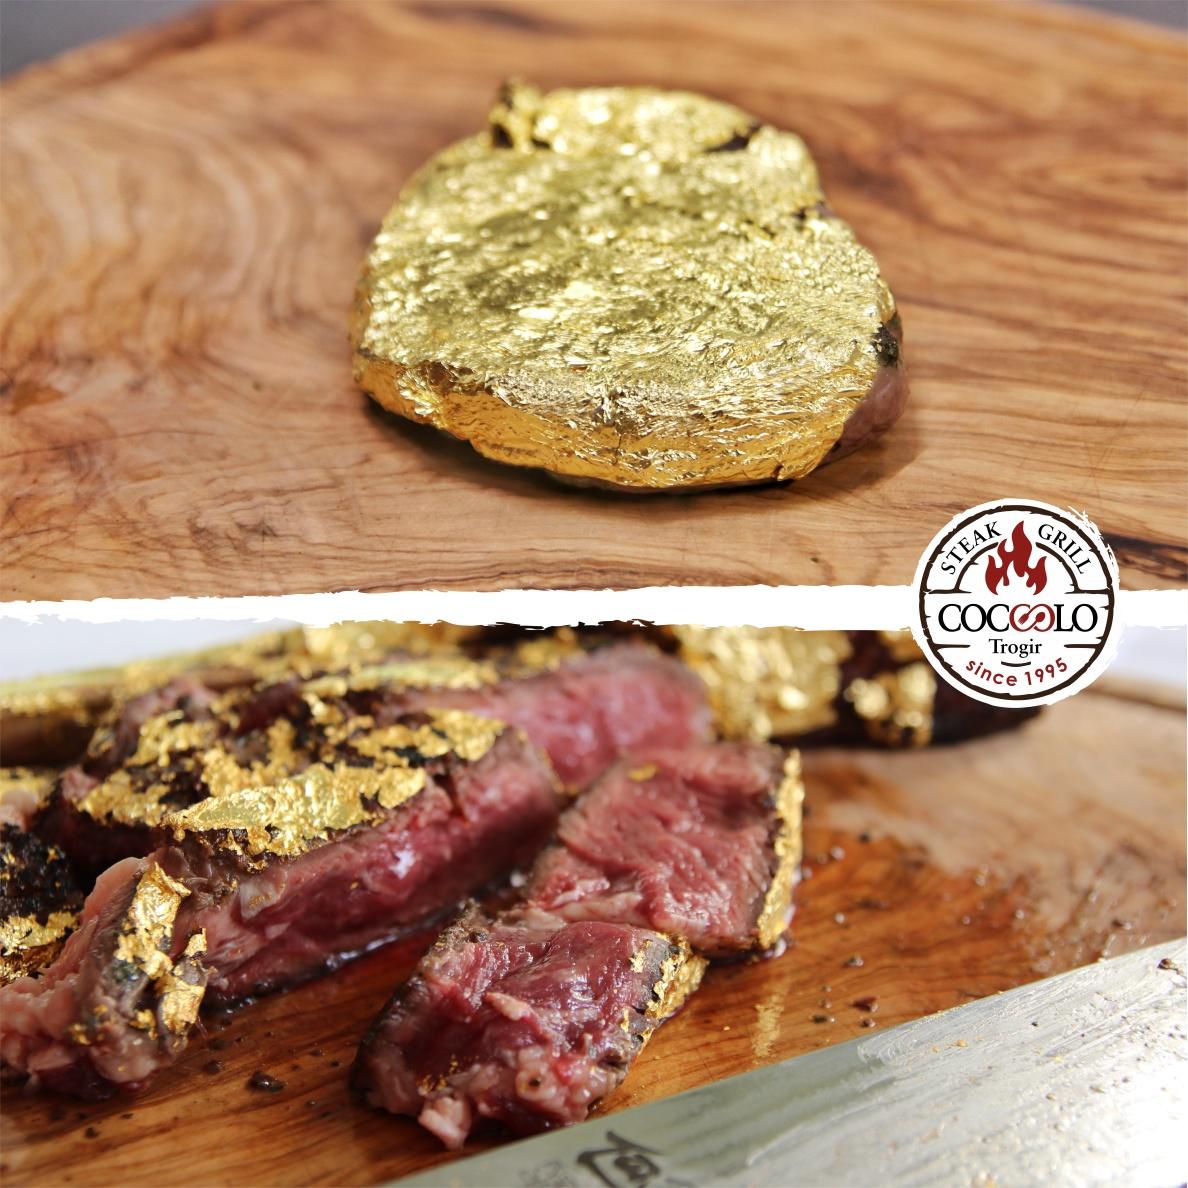 Popular Trogir restaurant first in Croatia to serve up gold steak